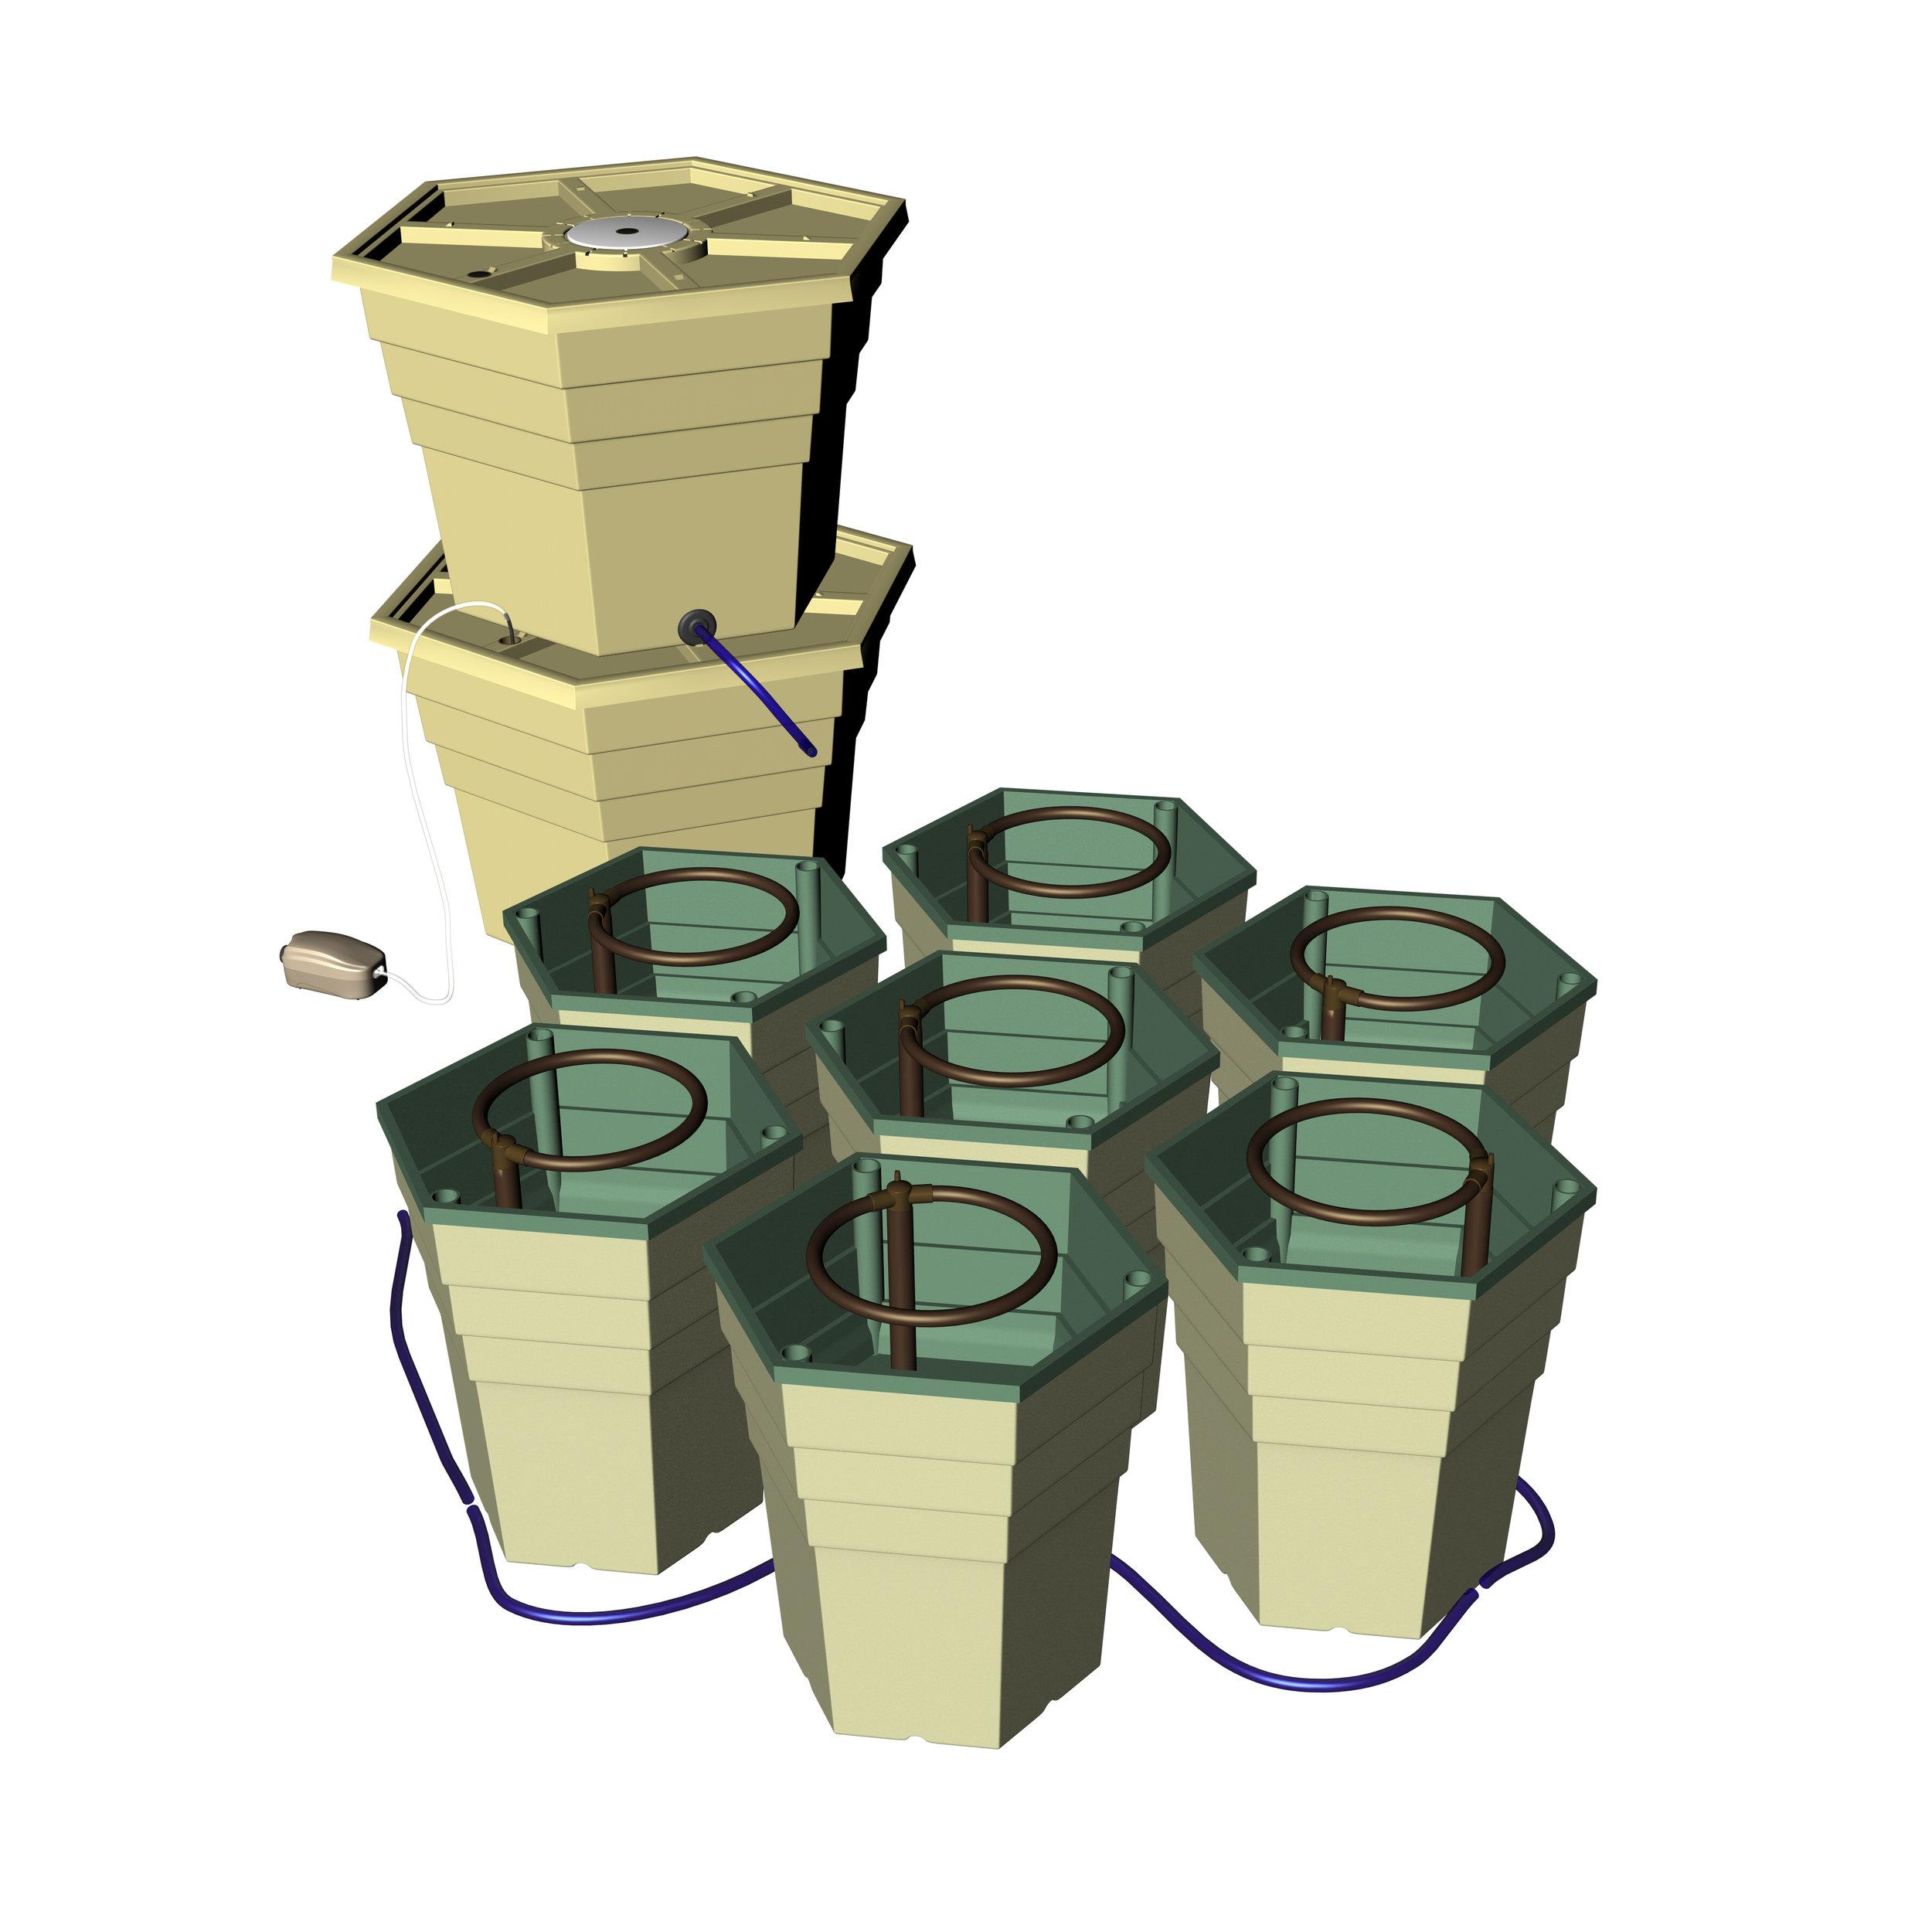 PowerGrower Hive Configuration